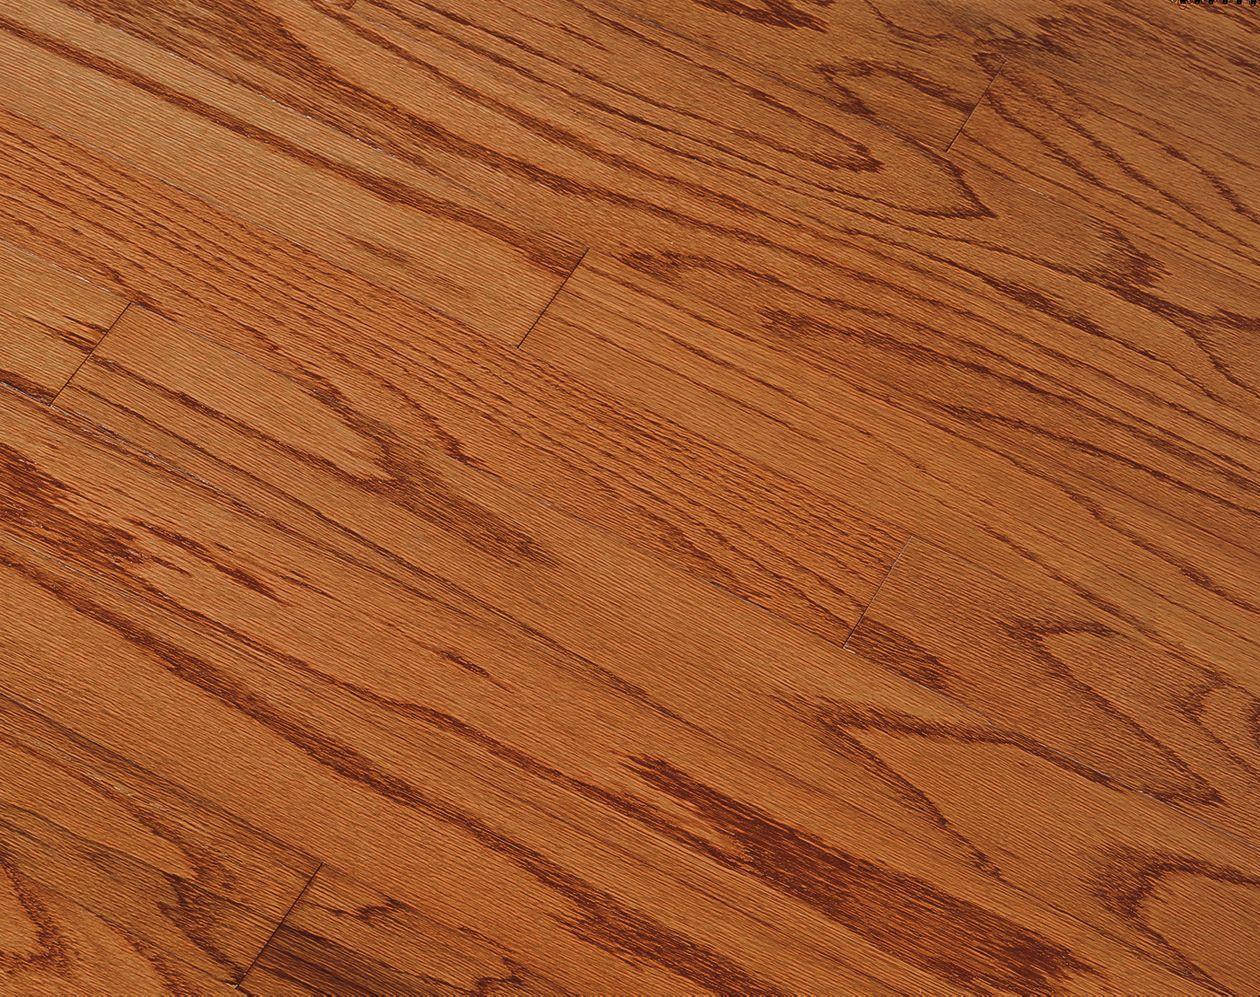 Bruce Springdale Plank Gunstock EB5215P  Discount Pricing